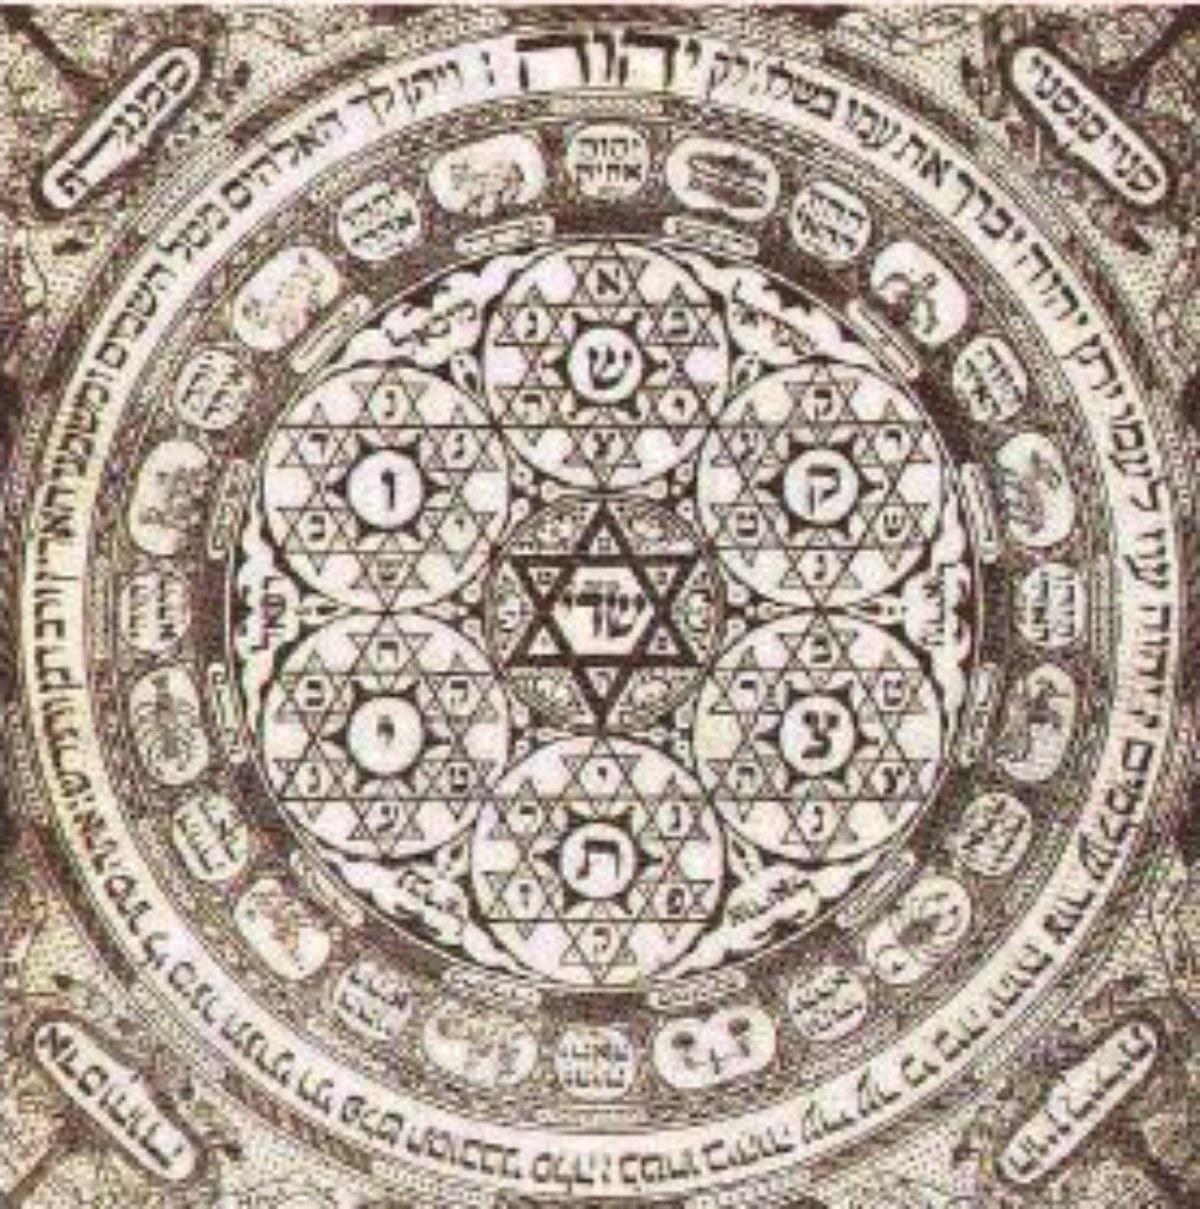 La Qabbalah ebraica